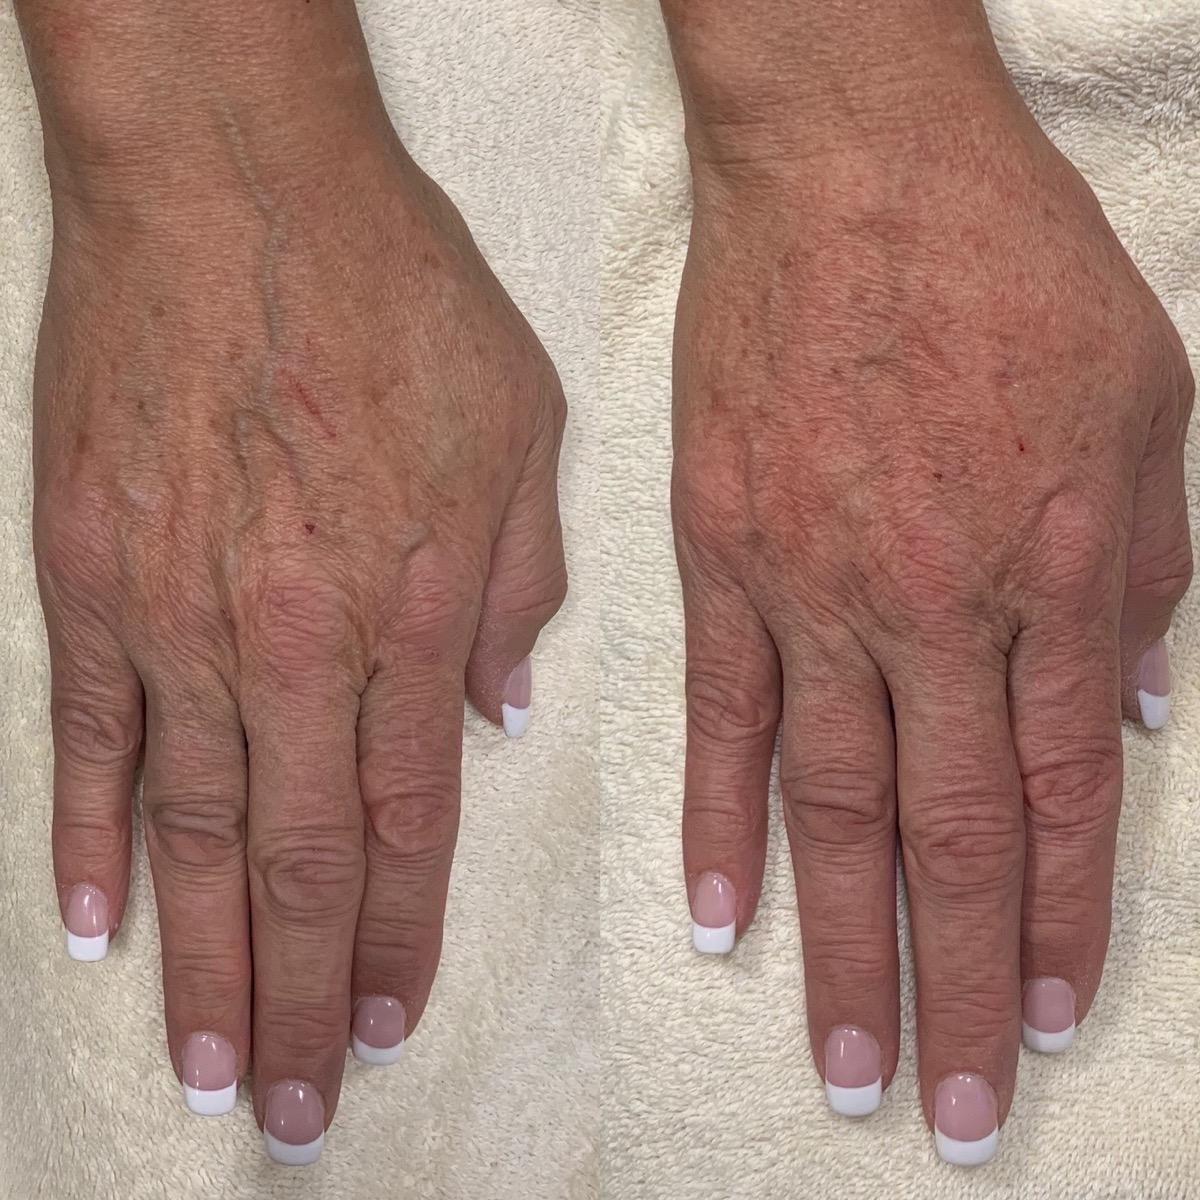 Hand Gallery - Patient 3199416 - Image 2